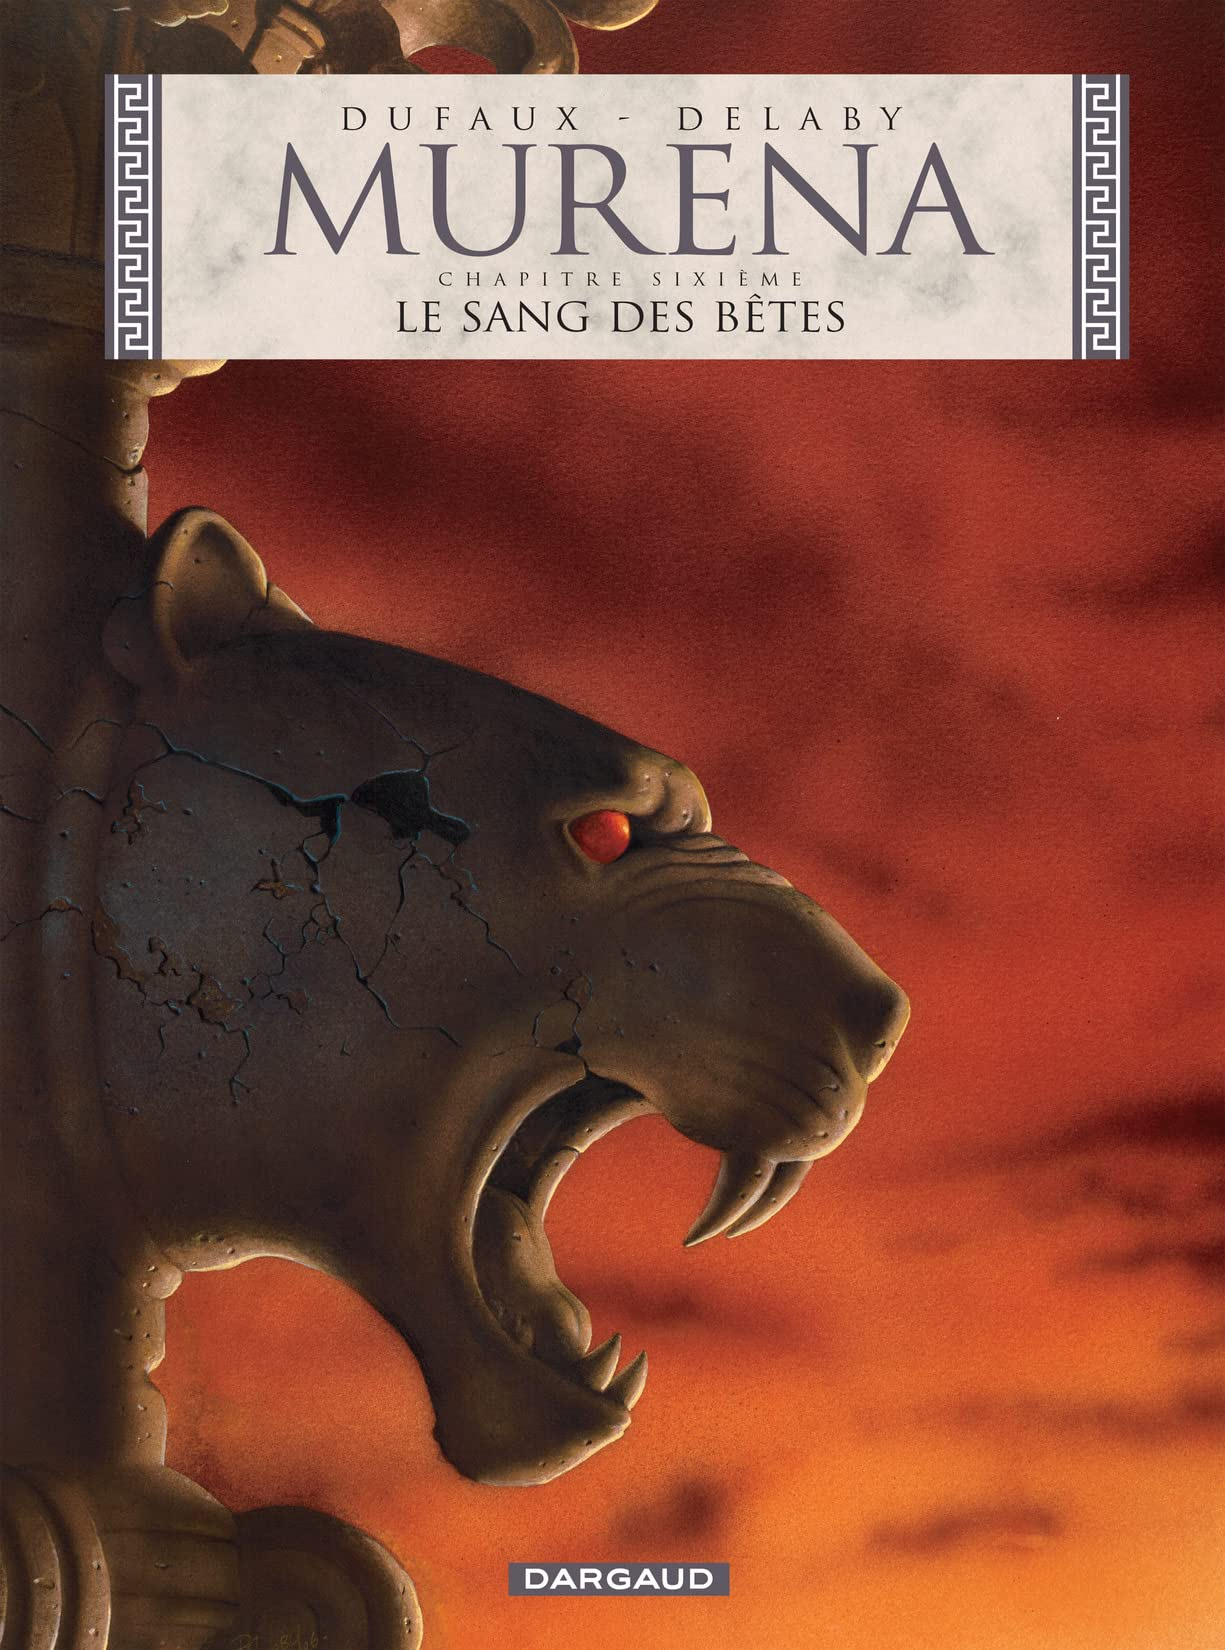 Murena Vol. 6: Le Sang des bêtes